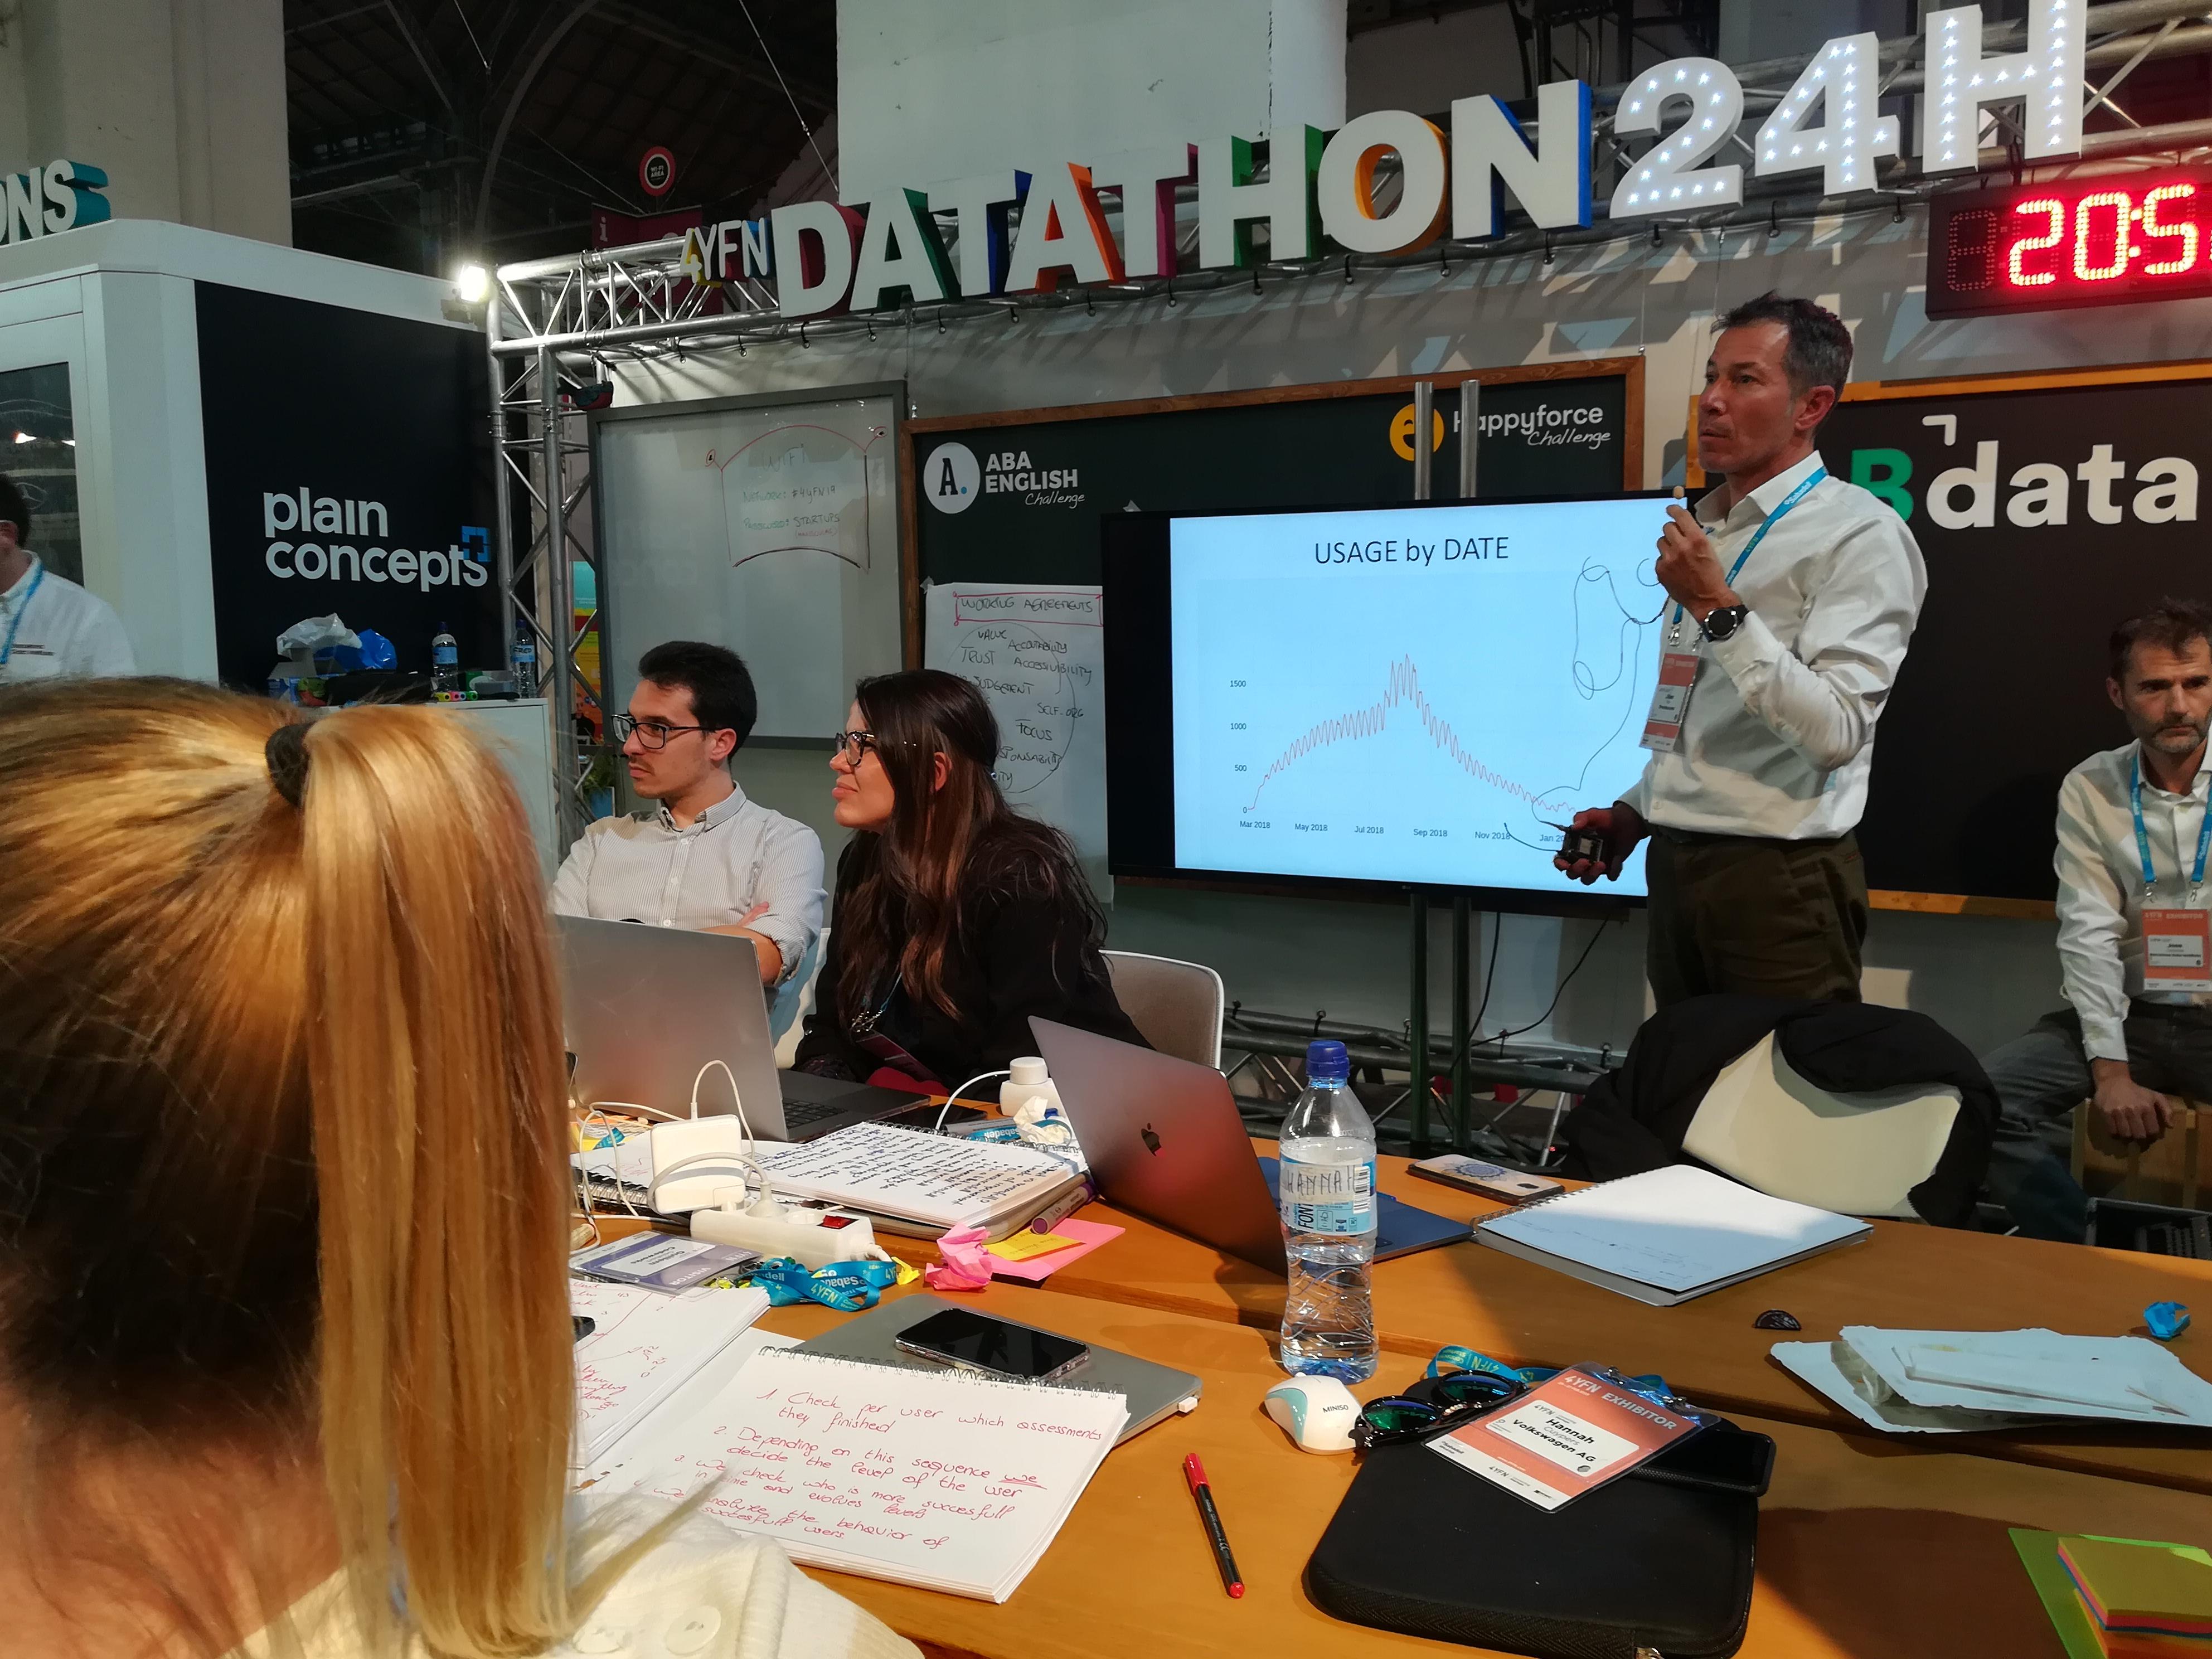 Datathon 4YFN Barcelona Data Institute